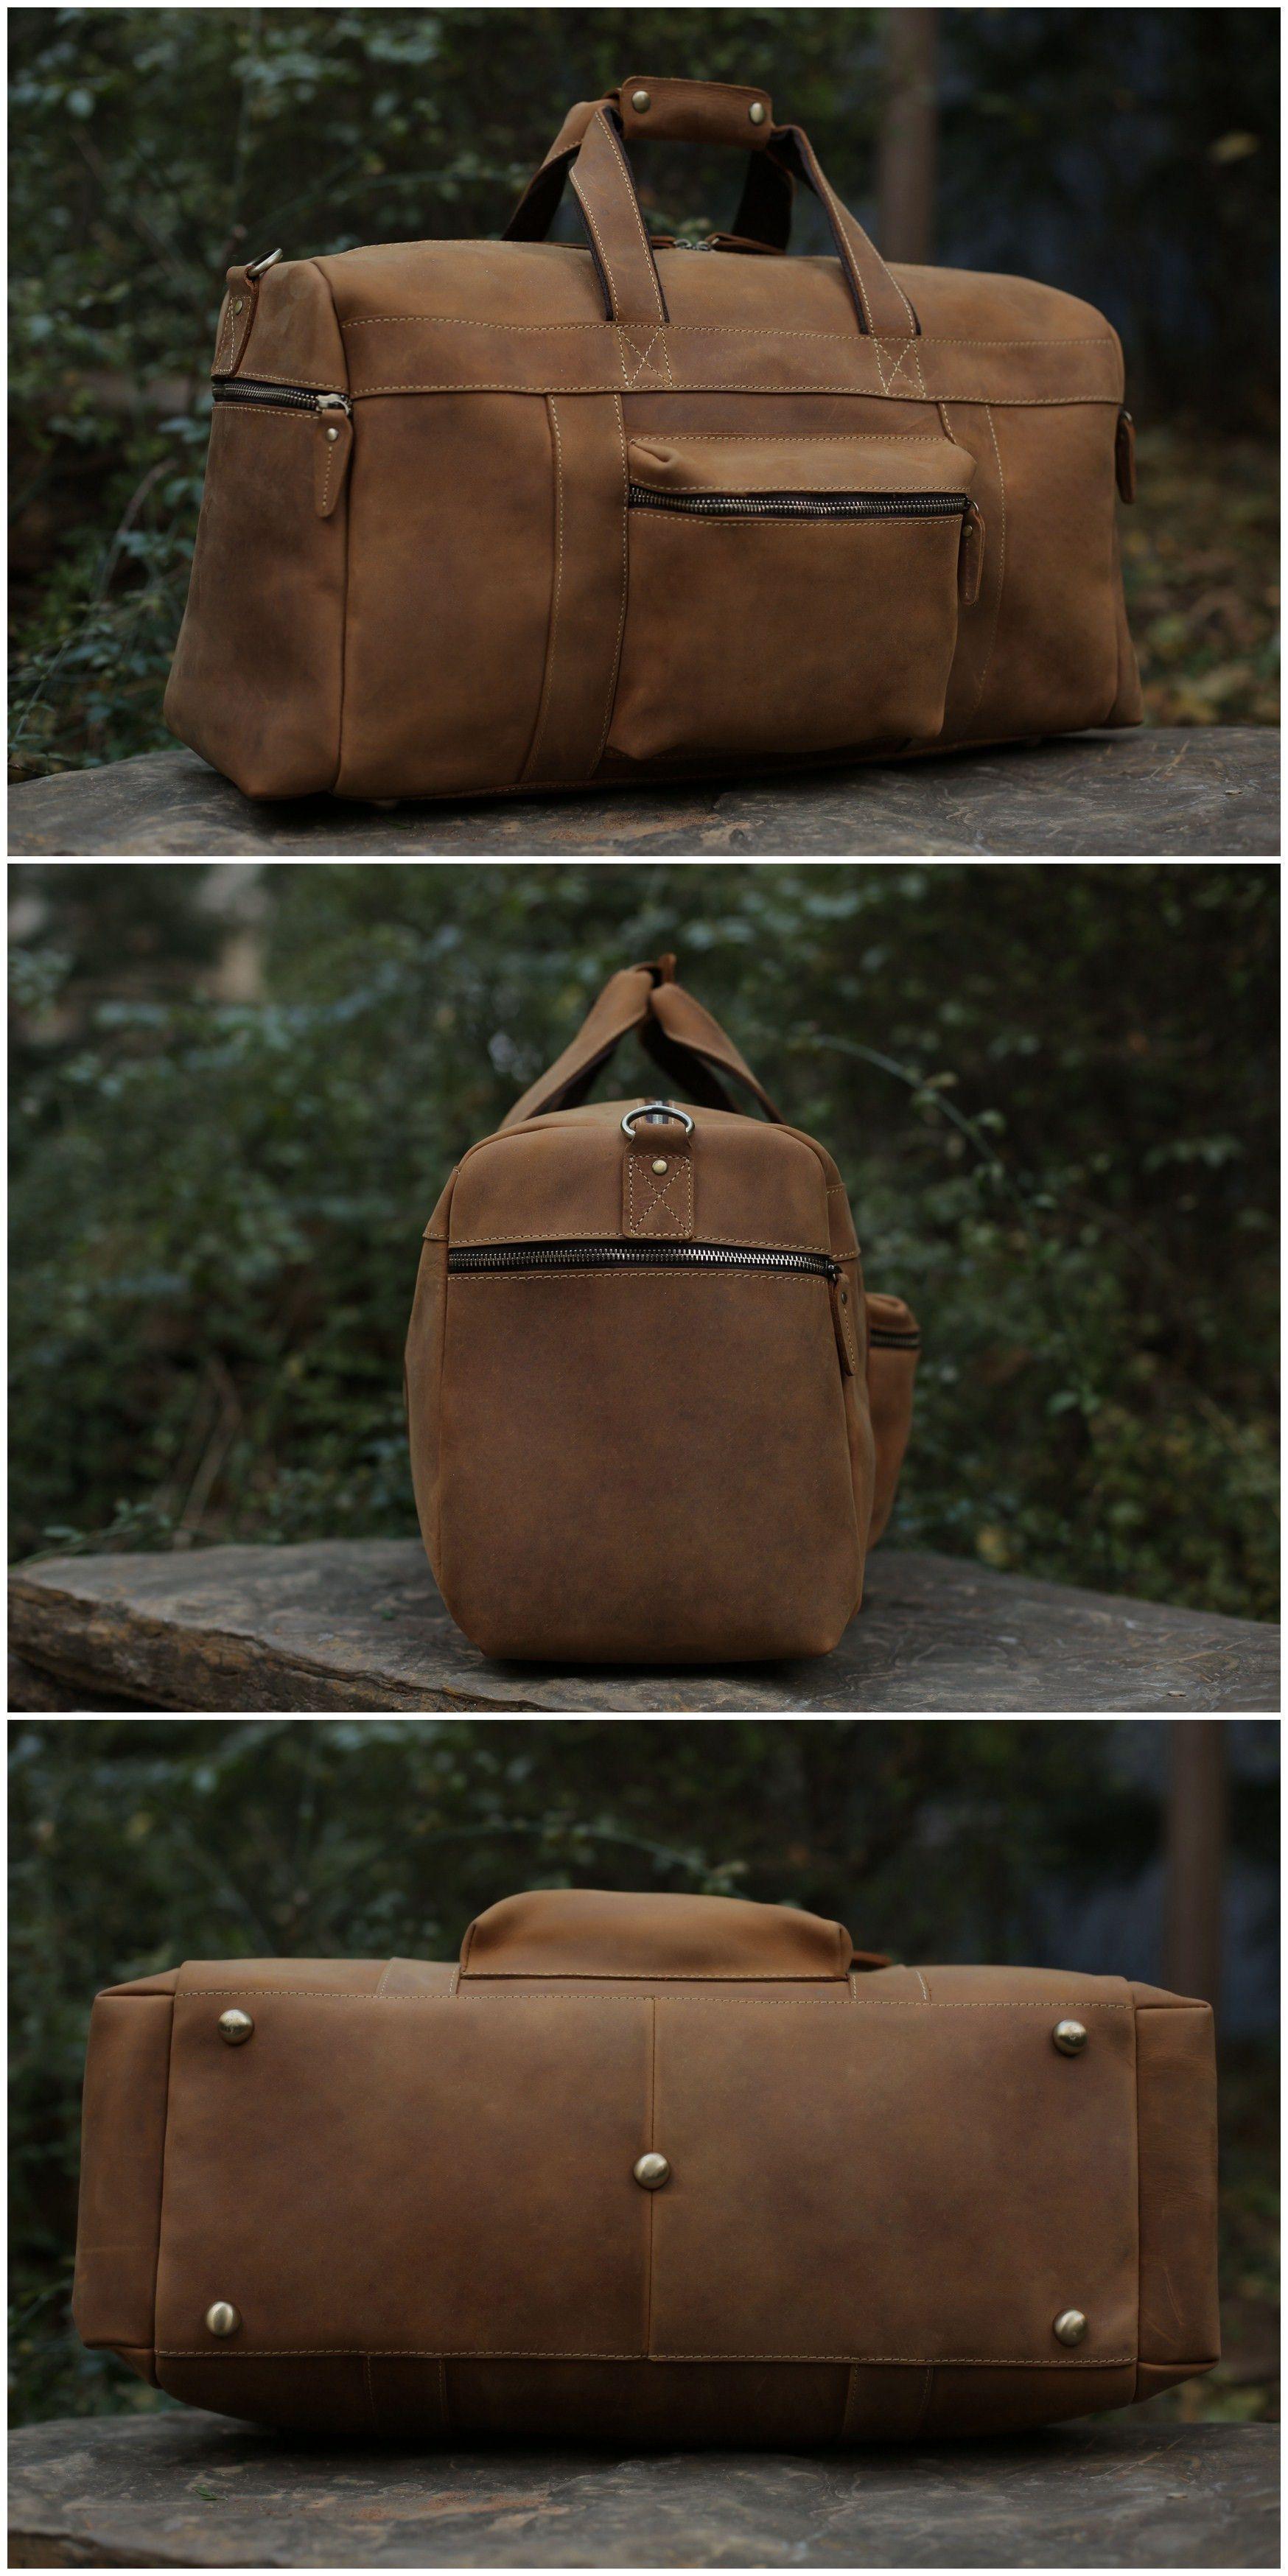 74a509f3ff Large Duffle Bag   Laptop Bag   Weekend Bag   Overnight Bag   Men s Travel  Bag